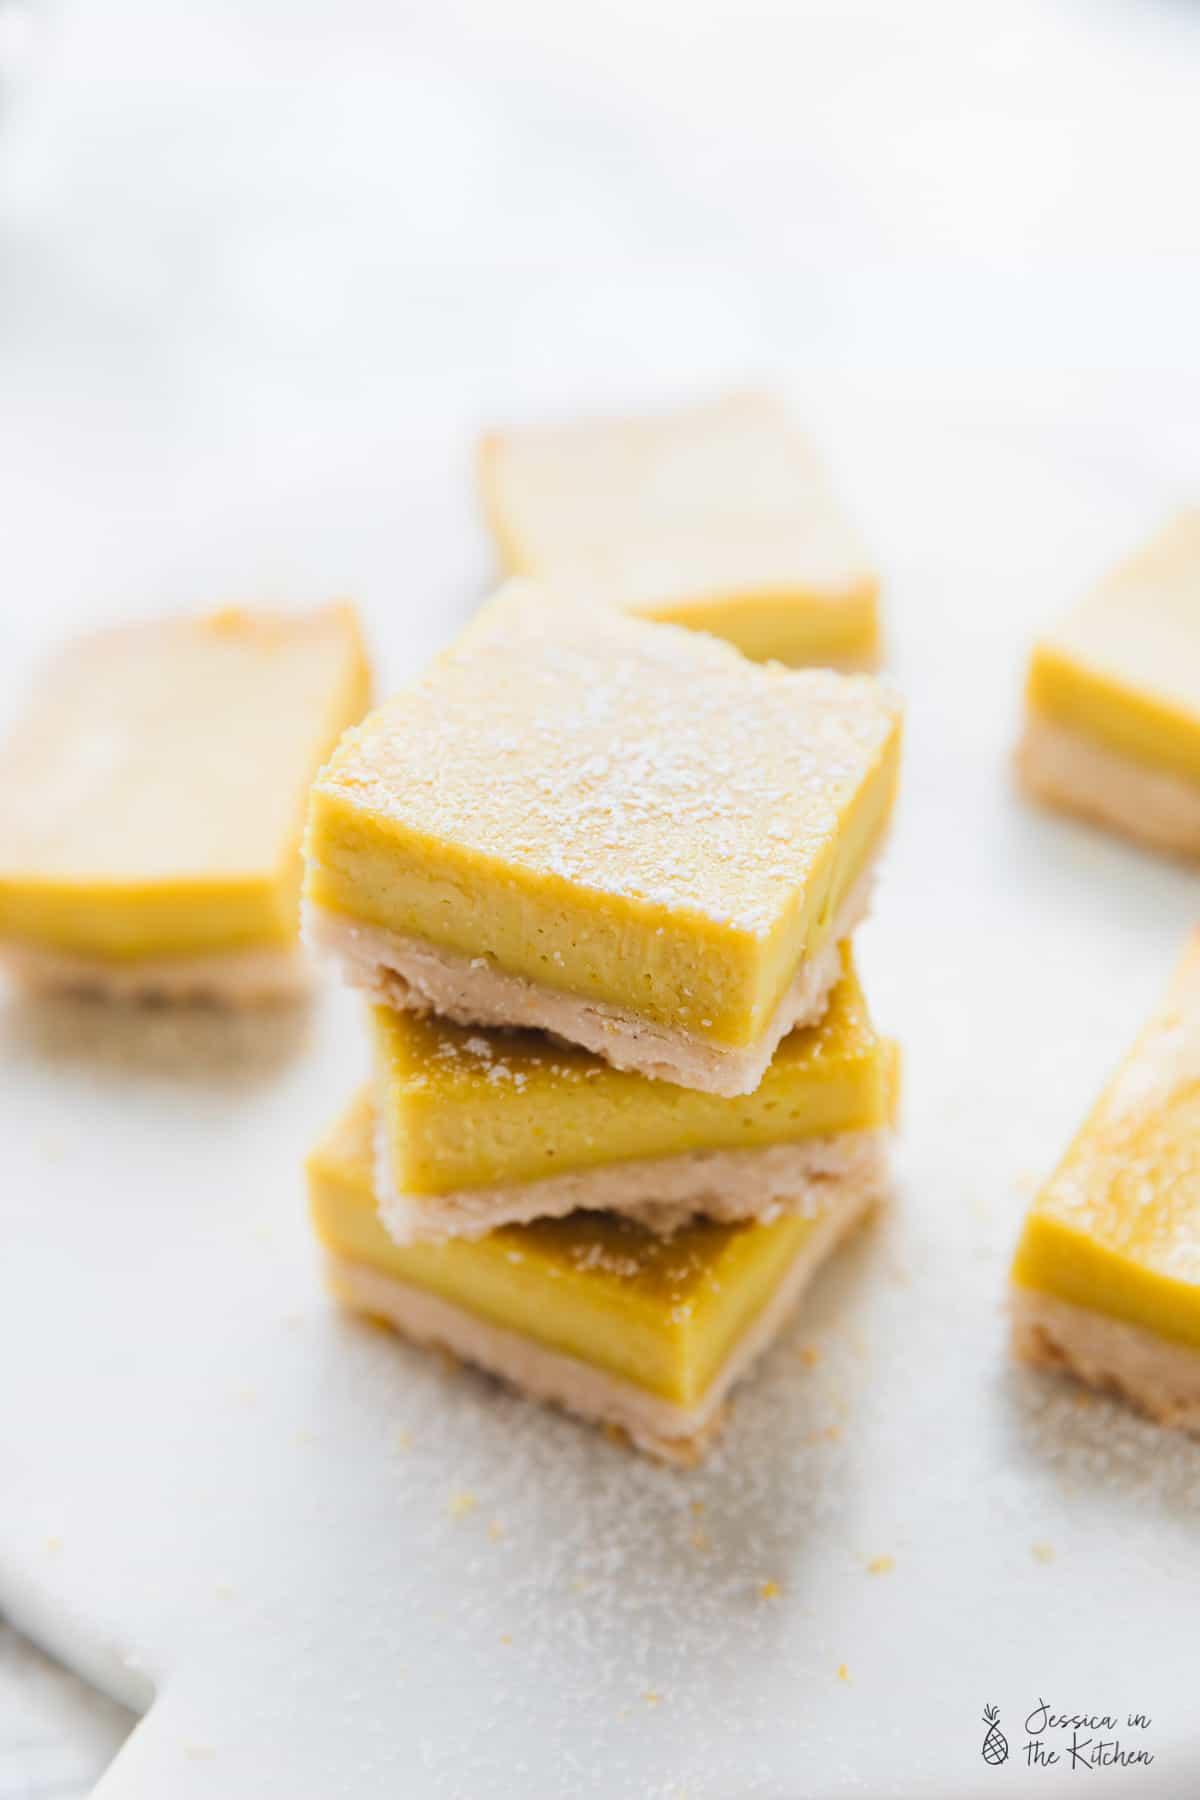 Gluten free and vegan lemon bars